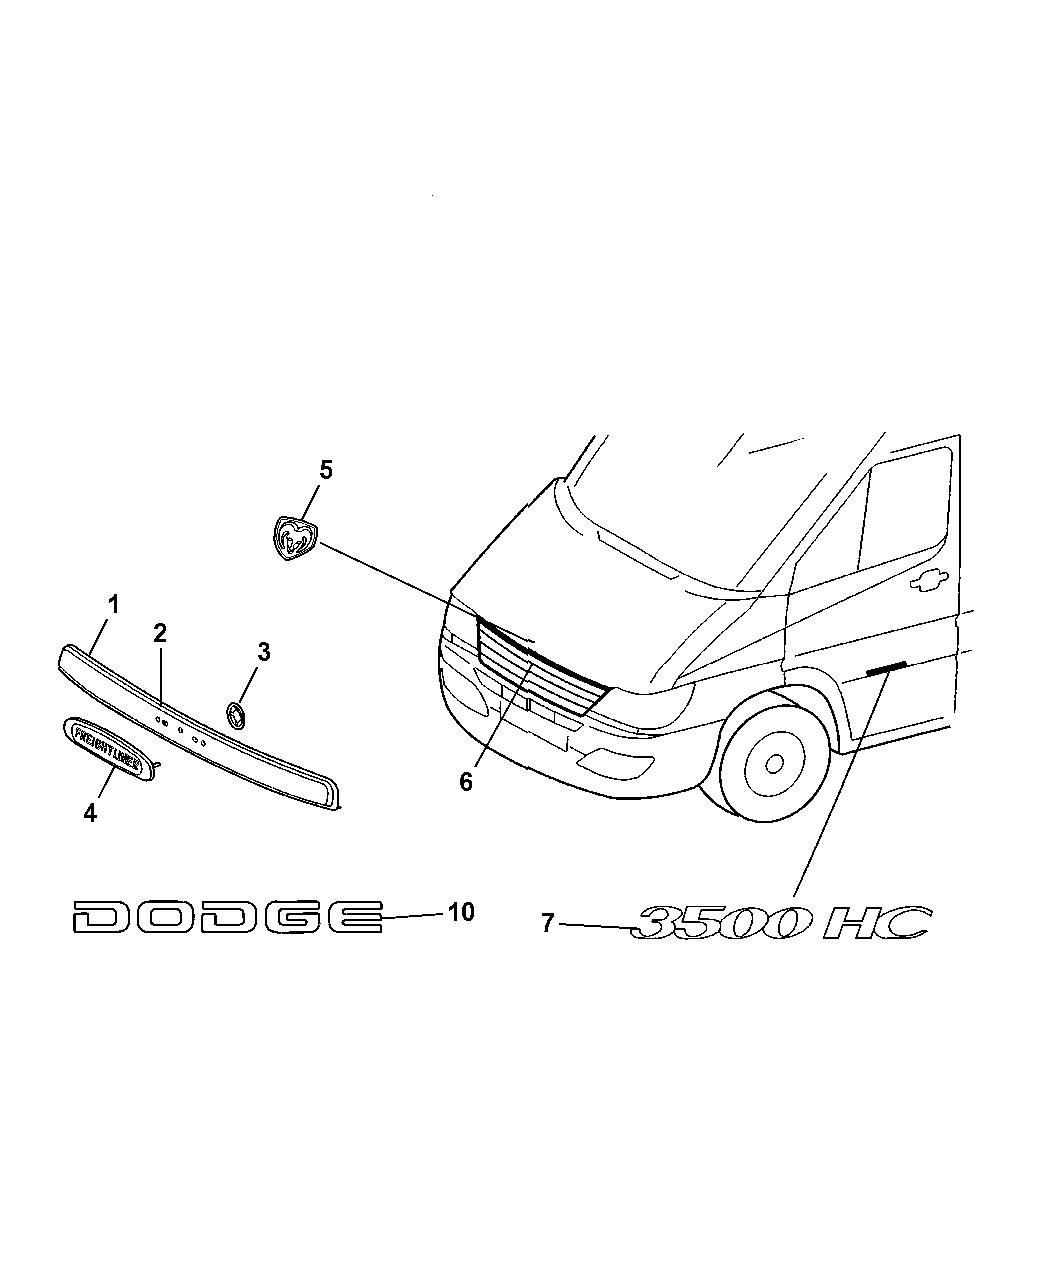 2006 Dodge Sprinter 3500 Nameplates & Decals